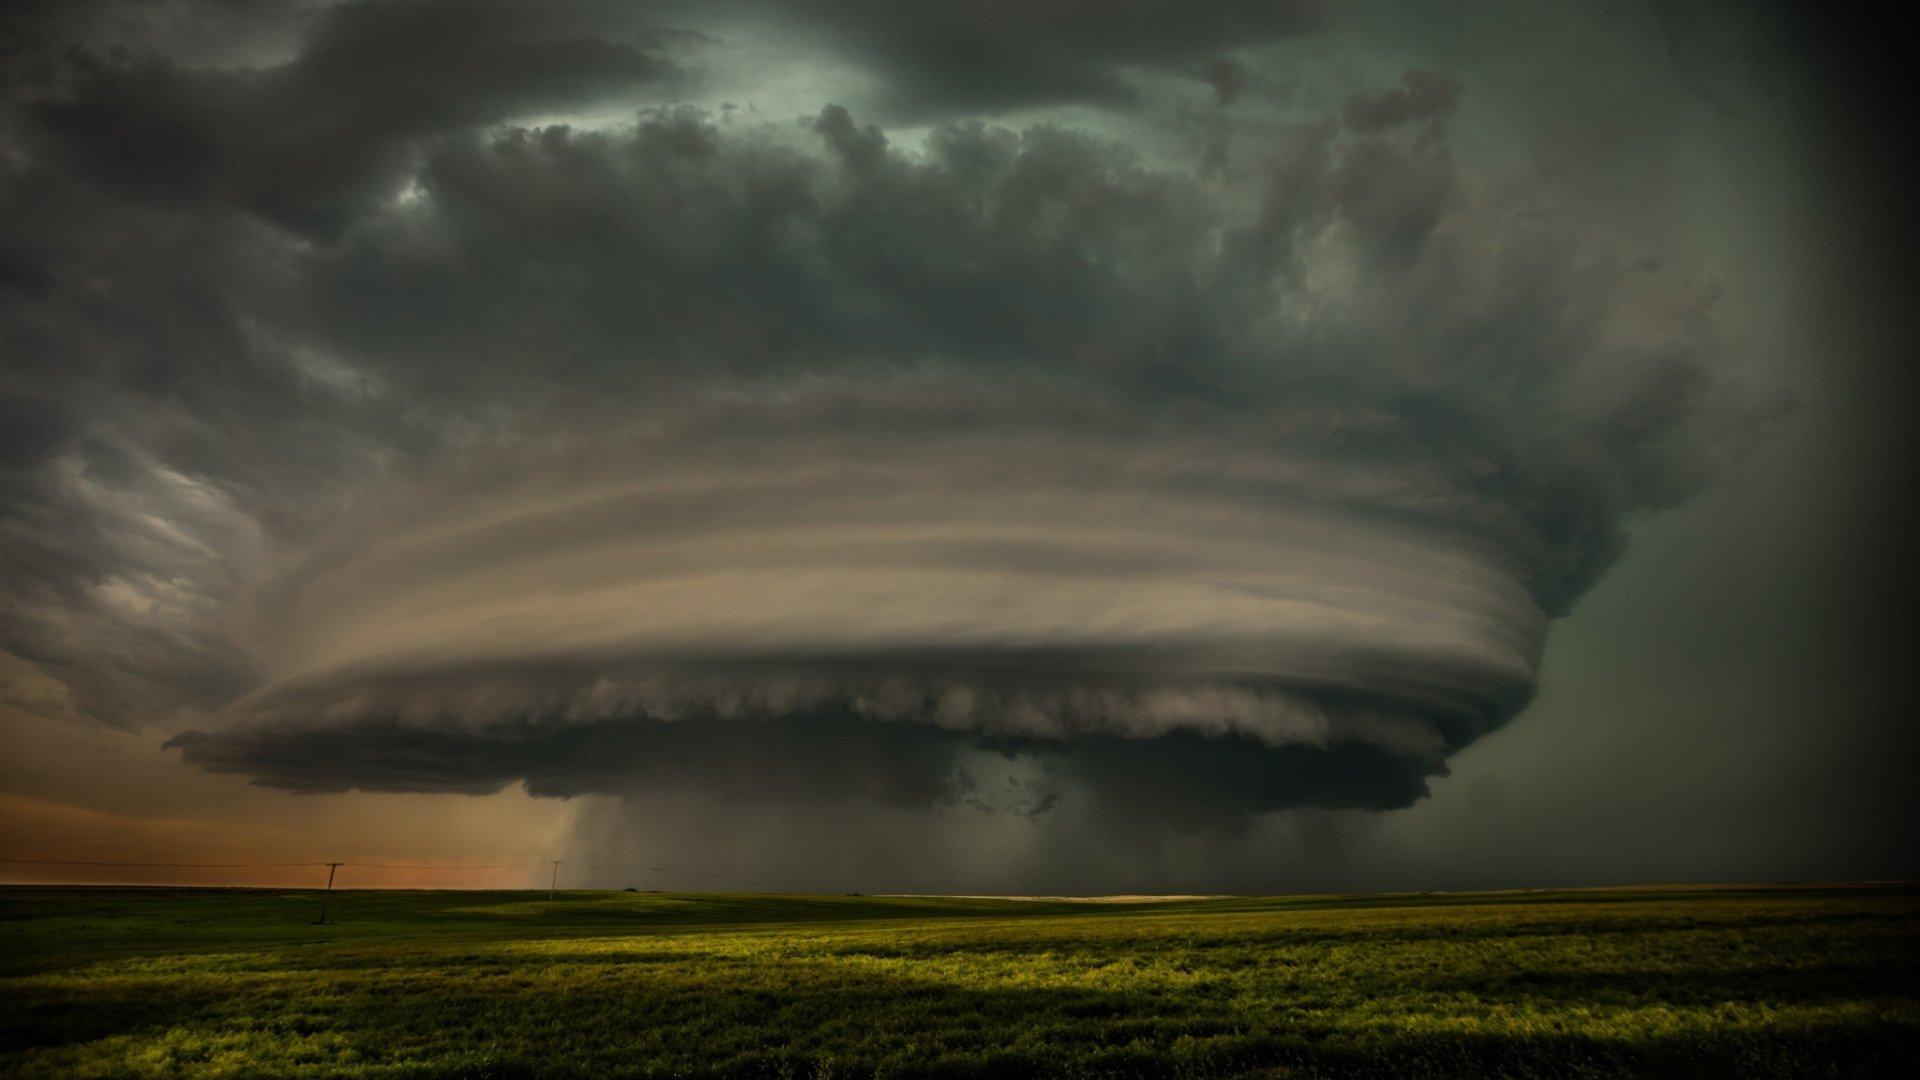 Tornado Wallpaper Image